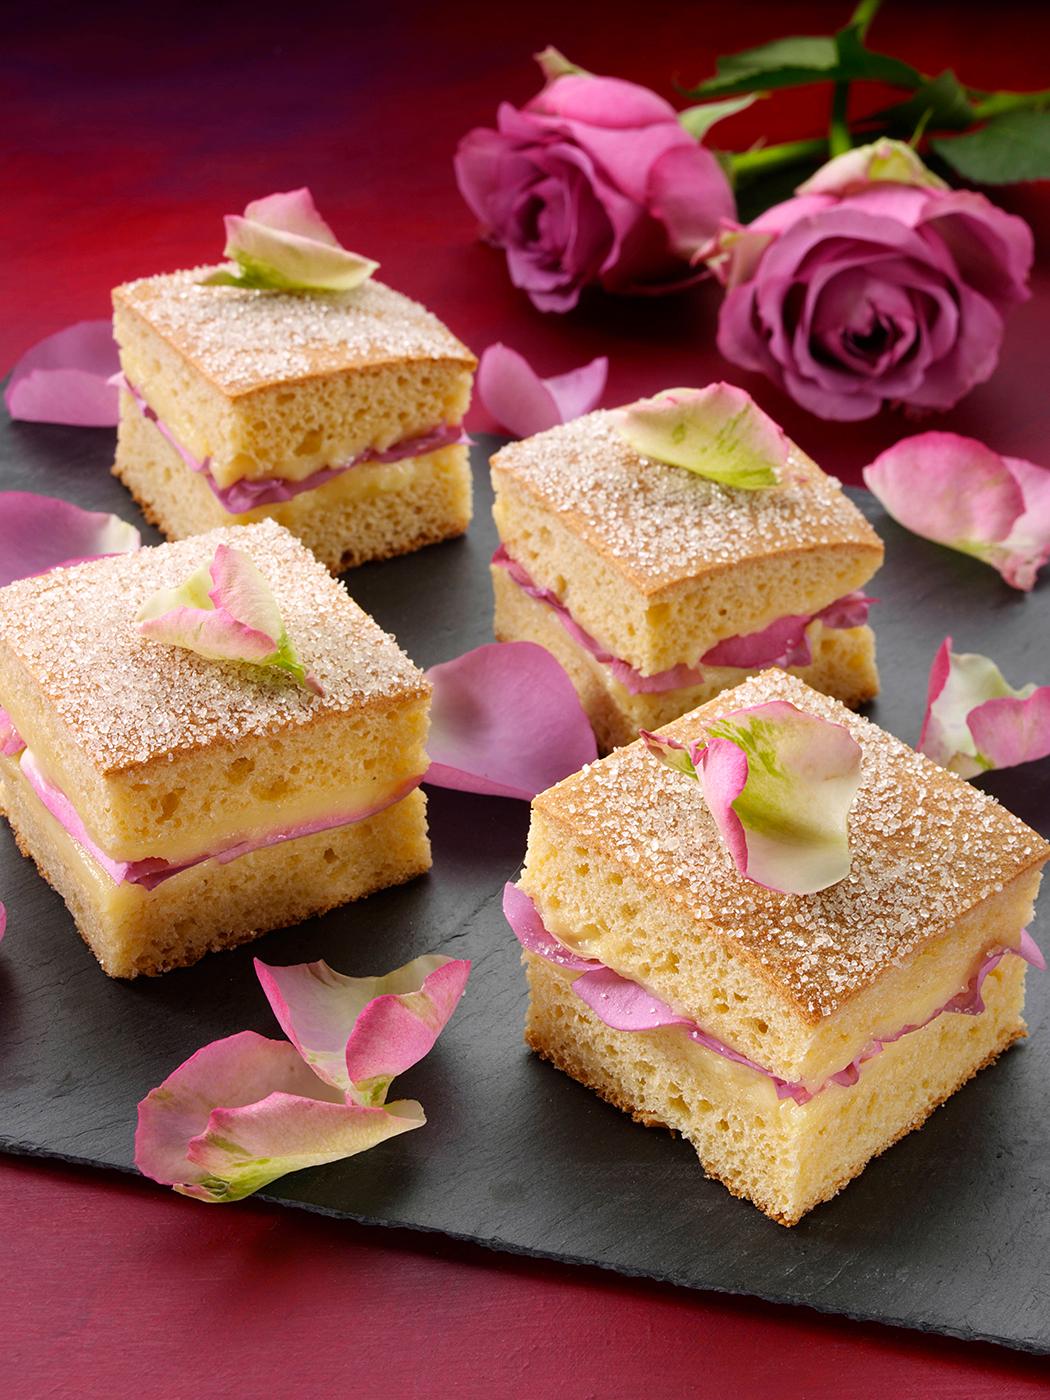 Rose petal sandwich cakes